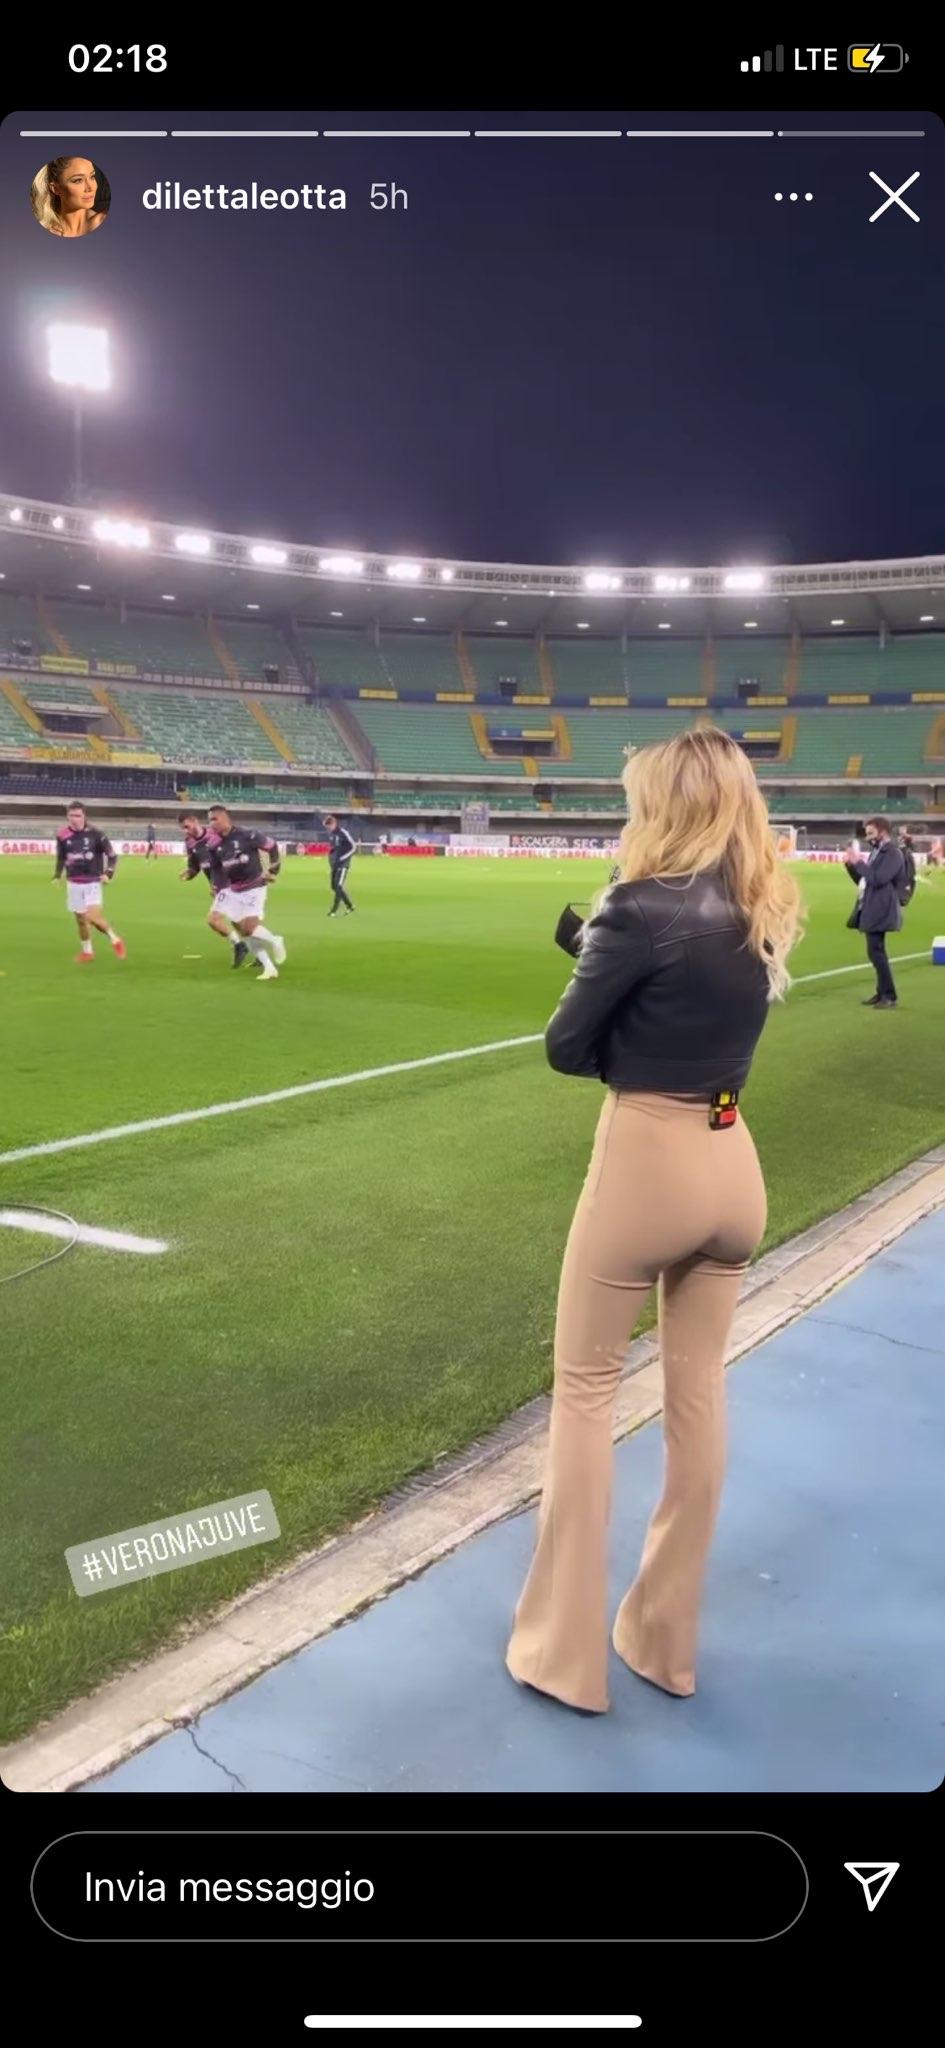 Diletta Leotta fondoschiena pantaloni